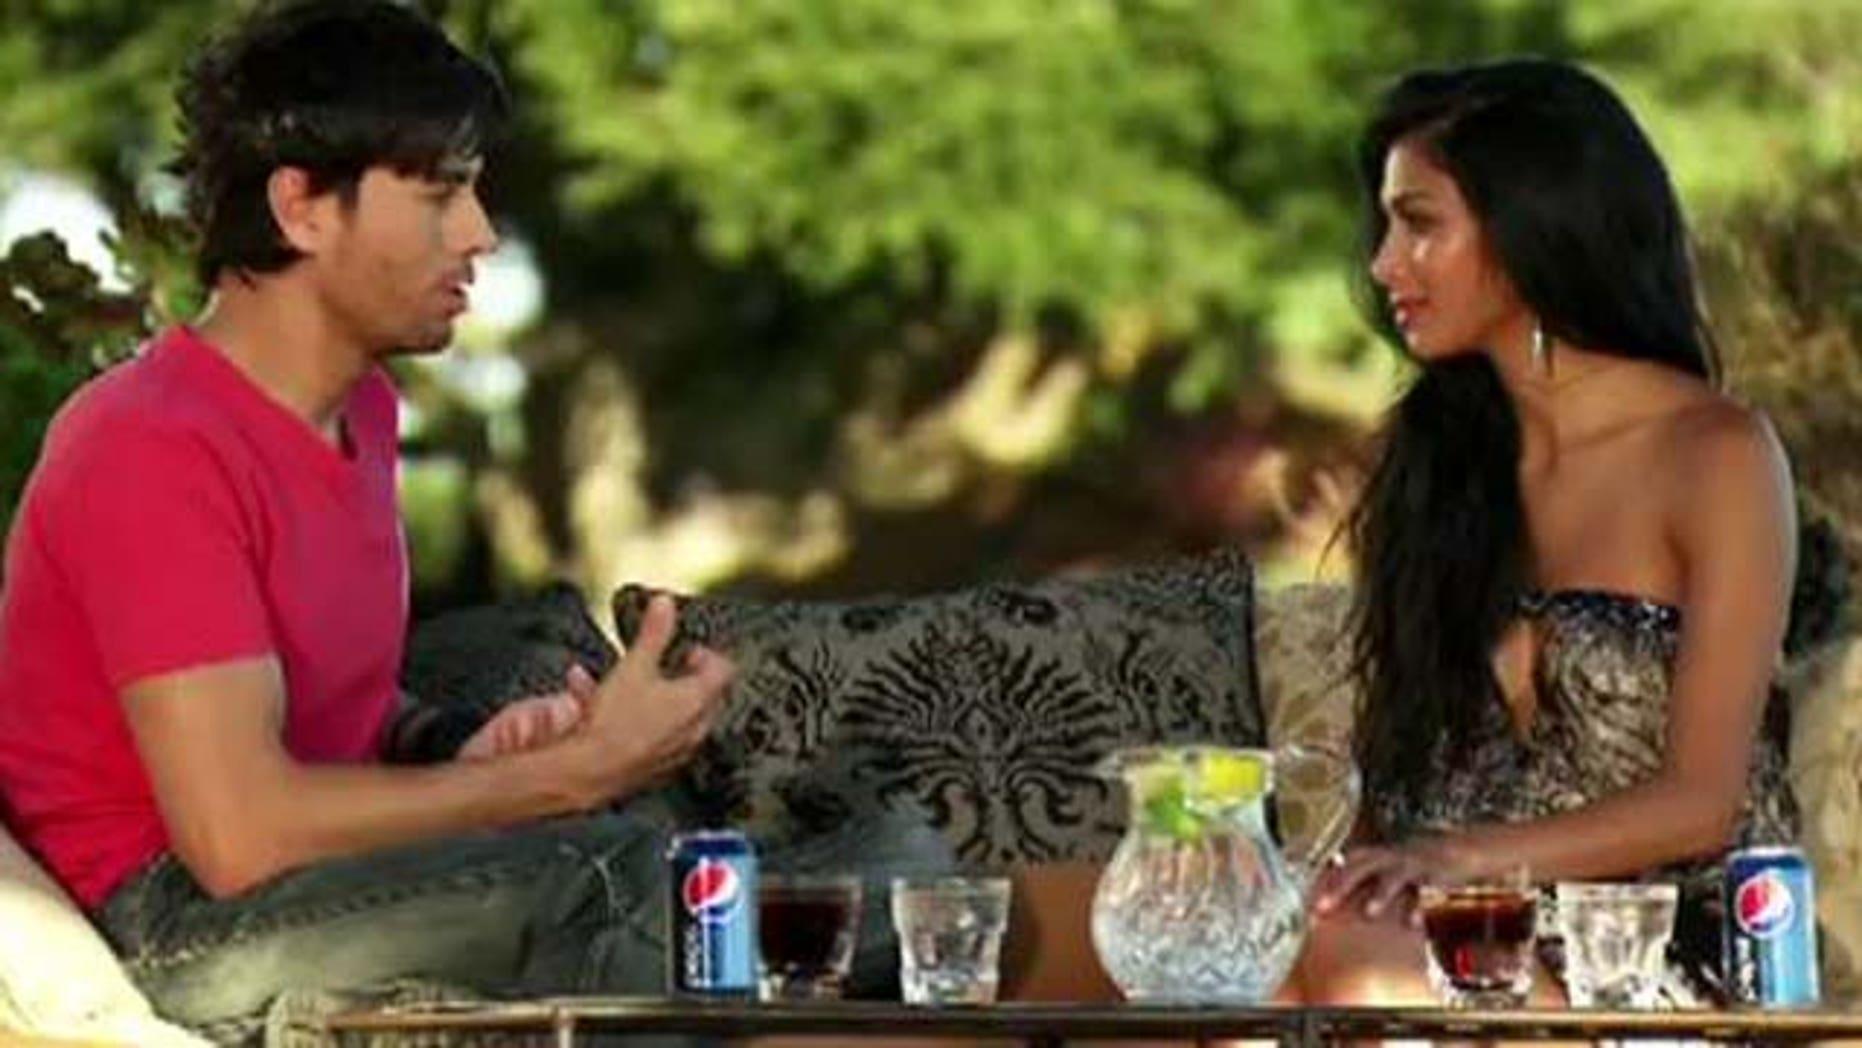 Oct. 16, 2011: Enrique Iglesias gives Nicole Scherzinger advice on contestant Josh Krajcik Sunday evening at her home in Malibu, Calif.